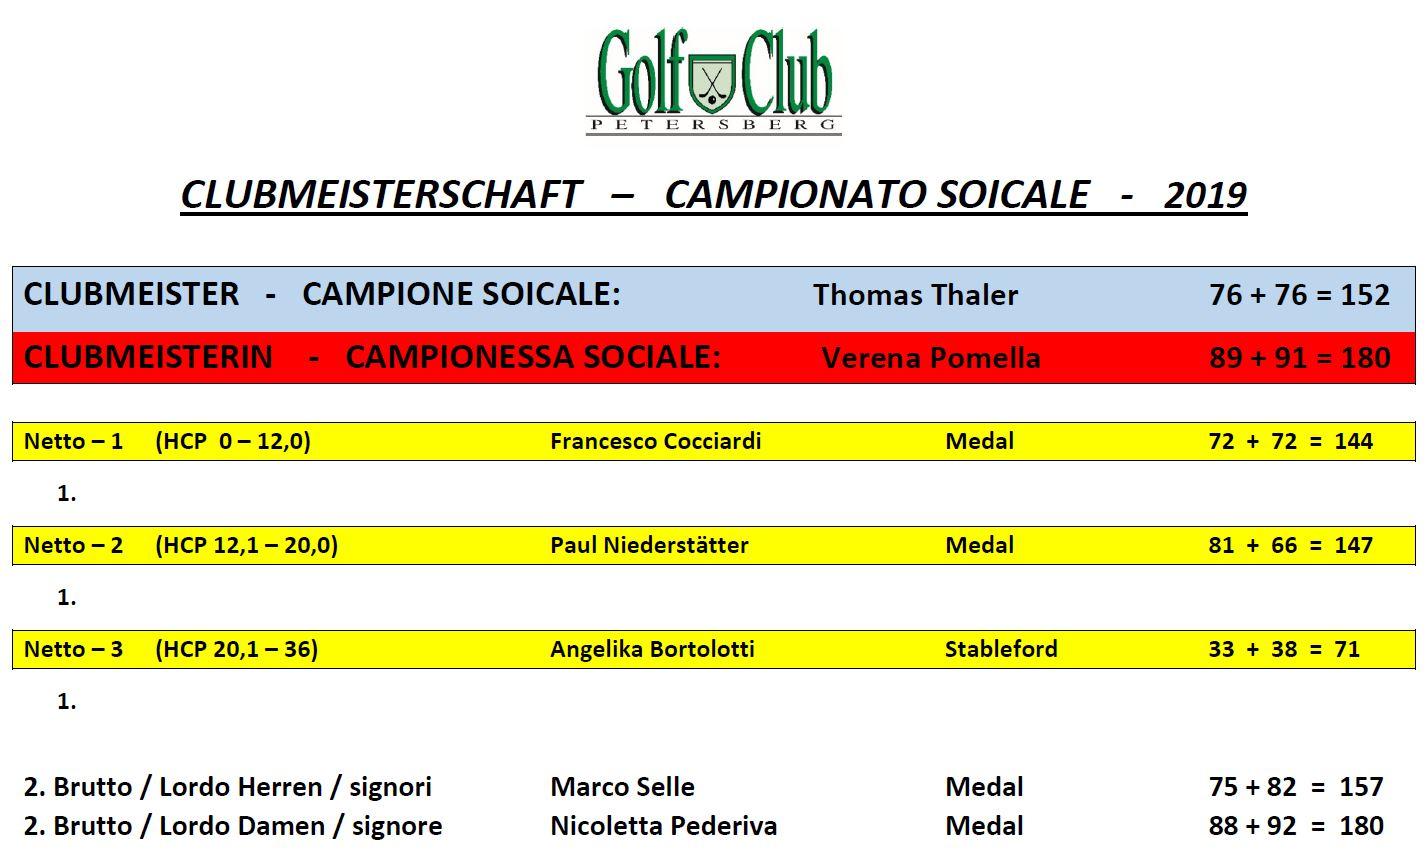 CLUBMEISTERSCHAFT - CAMPIONATO SOCIALE Clubmeister 2019